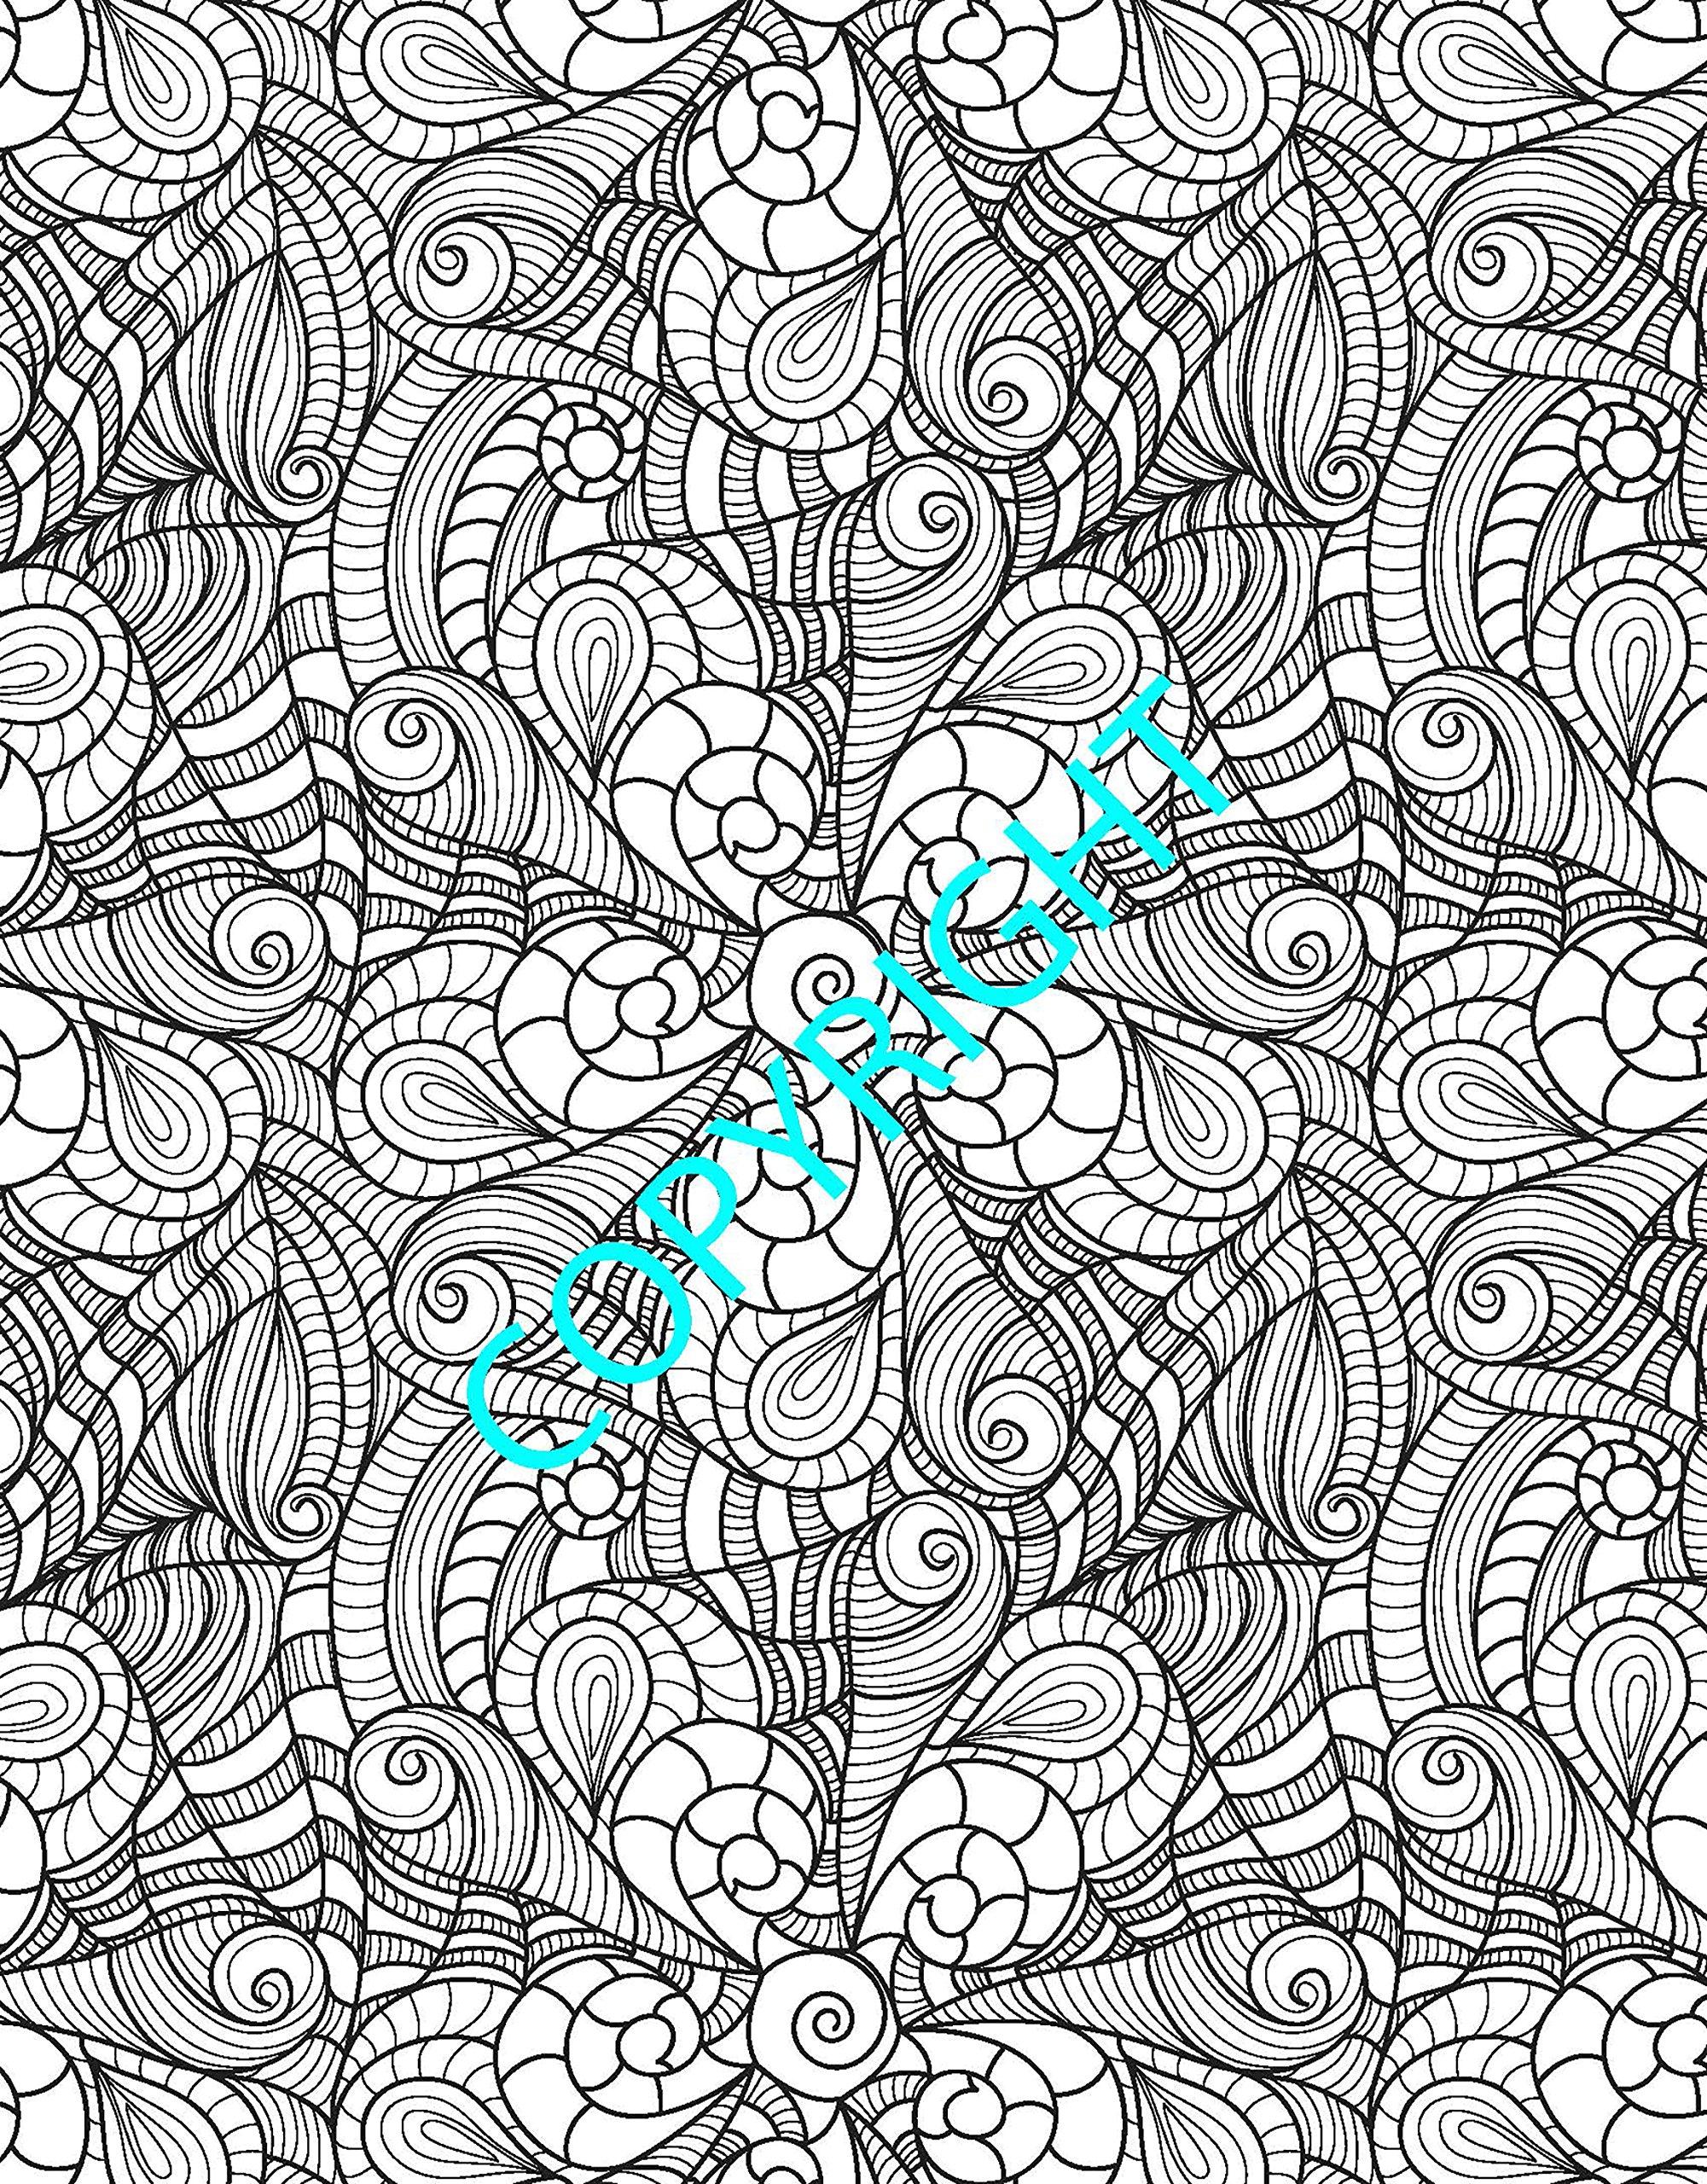 Color art mandala wonders - Kaleidoscope Wonders Color Art For Everyone Leisure Arts The Guild Of Master Craftsman Publications Ltd 0028906067071 Amazon Com Books